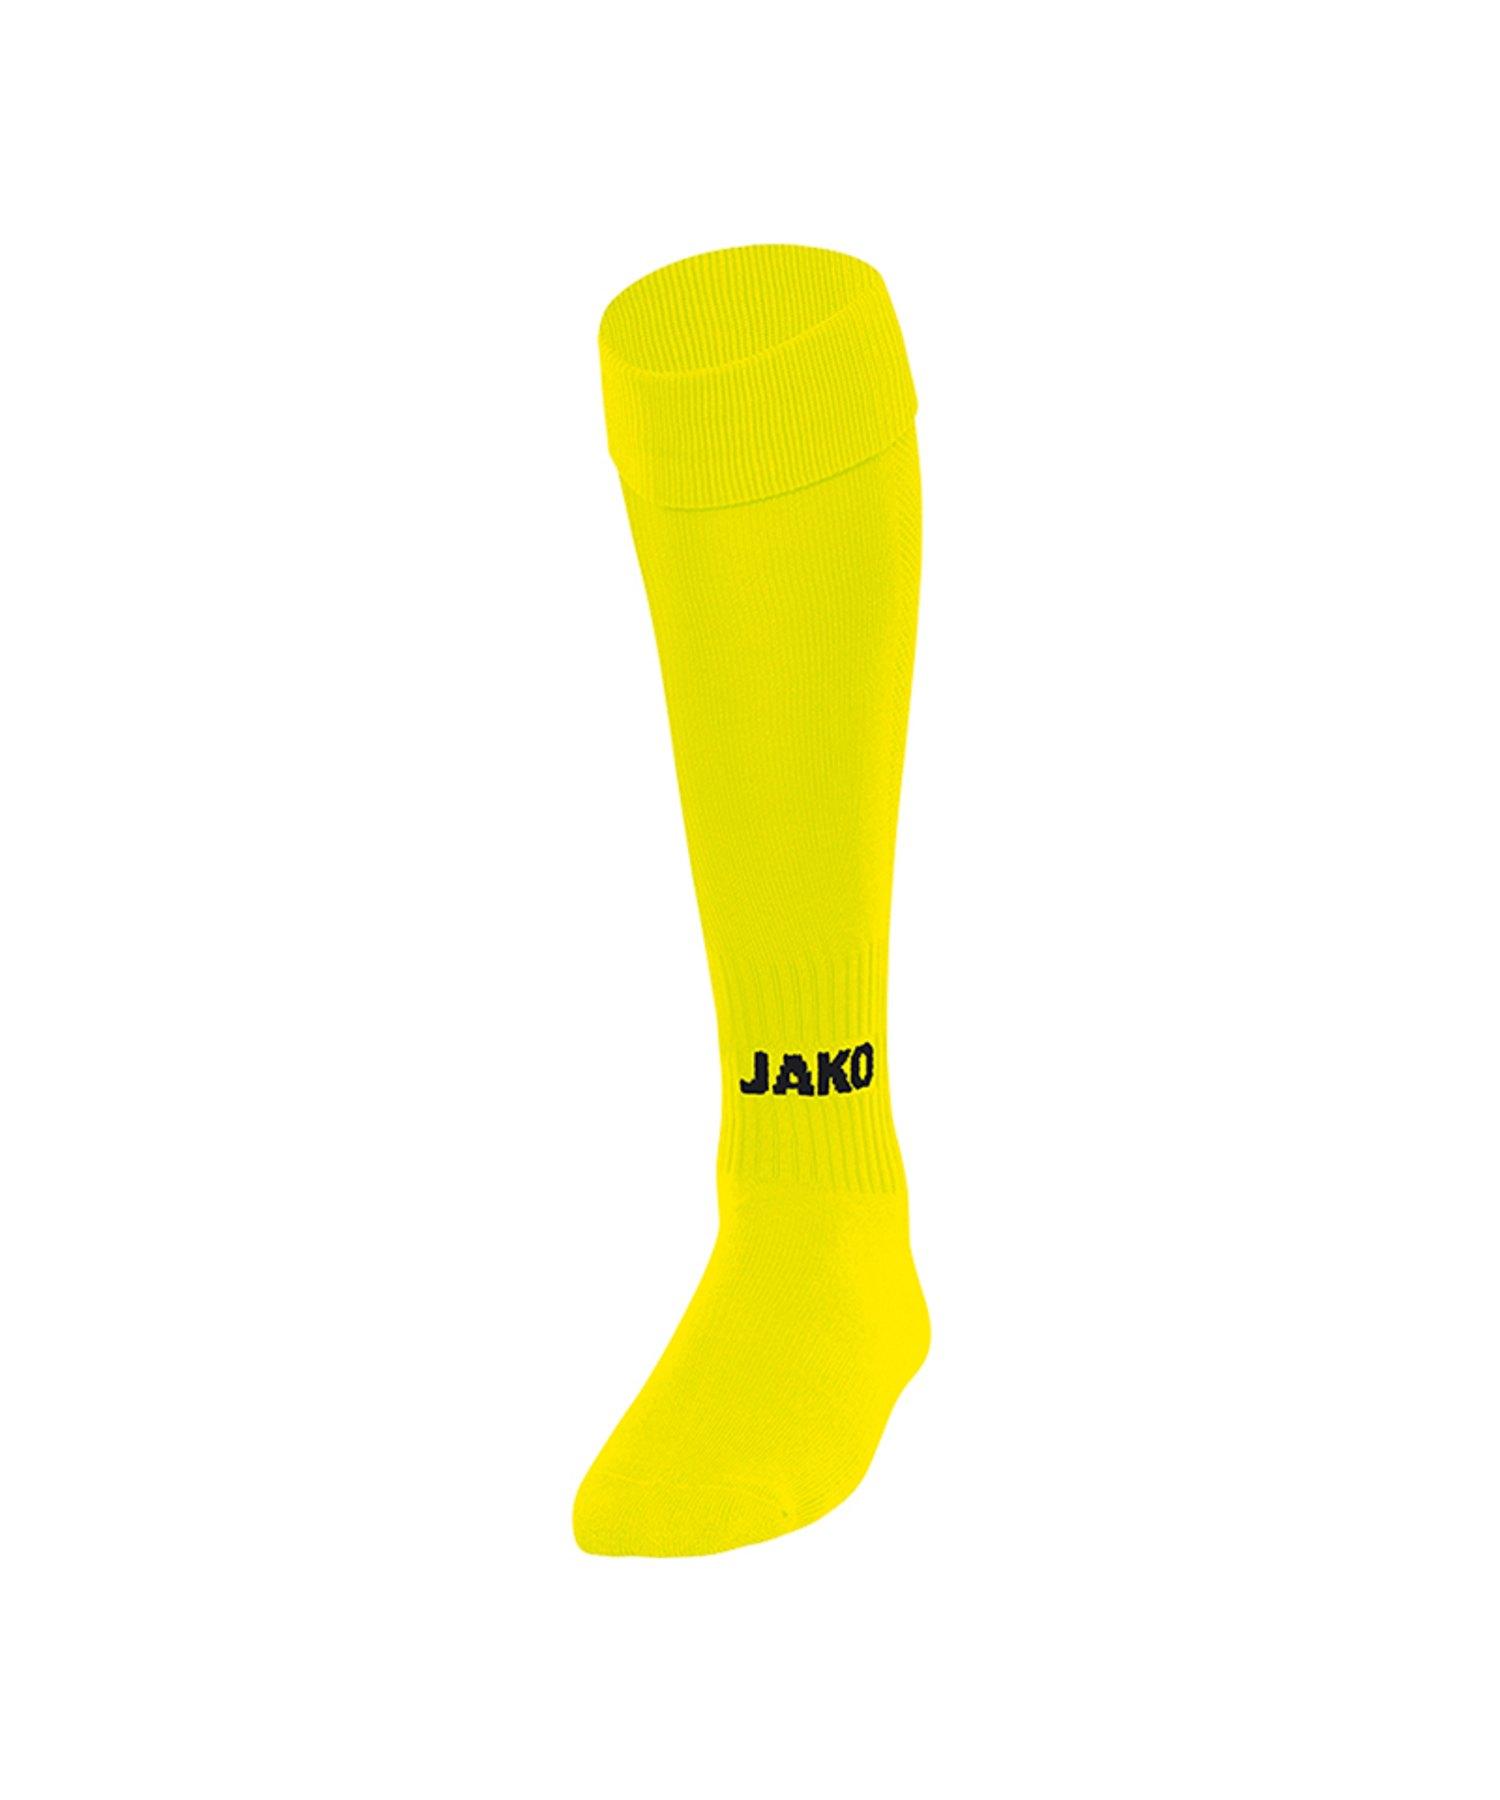 Fußball Stutzen Stutzenstrumpf Socken Stutzenstrümpfe Elastisch Lang